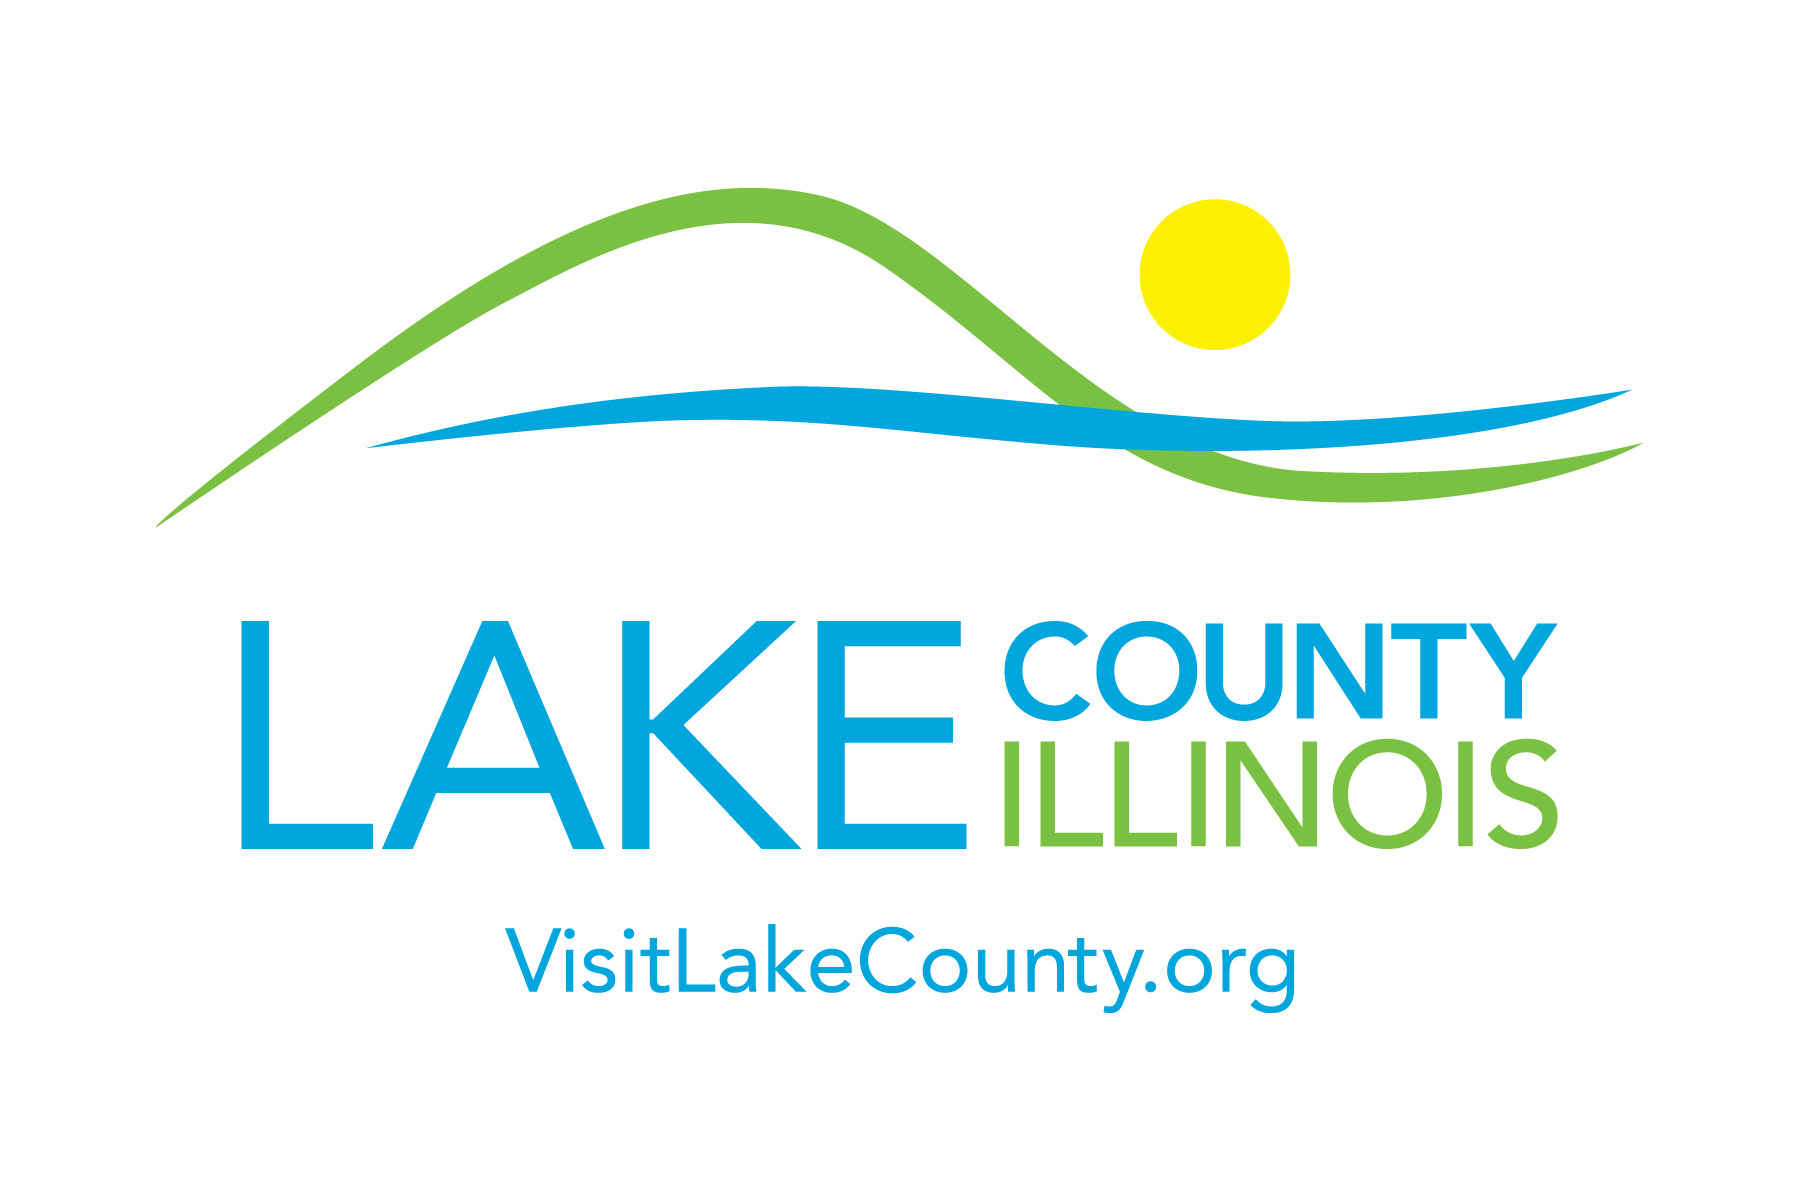 VisitLakeCounty.Org